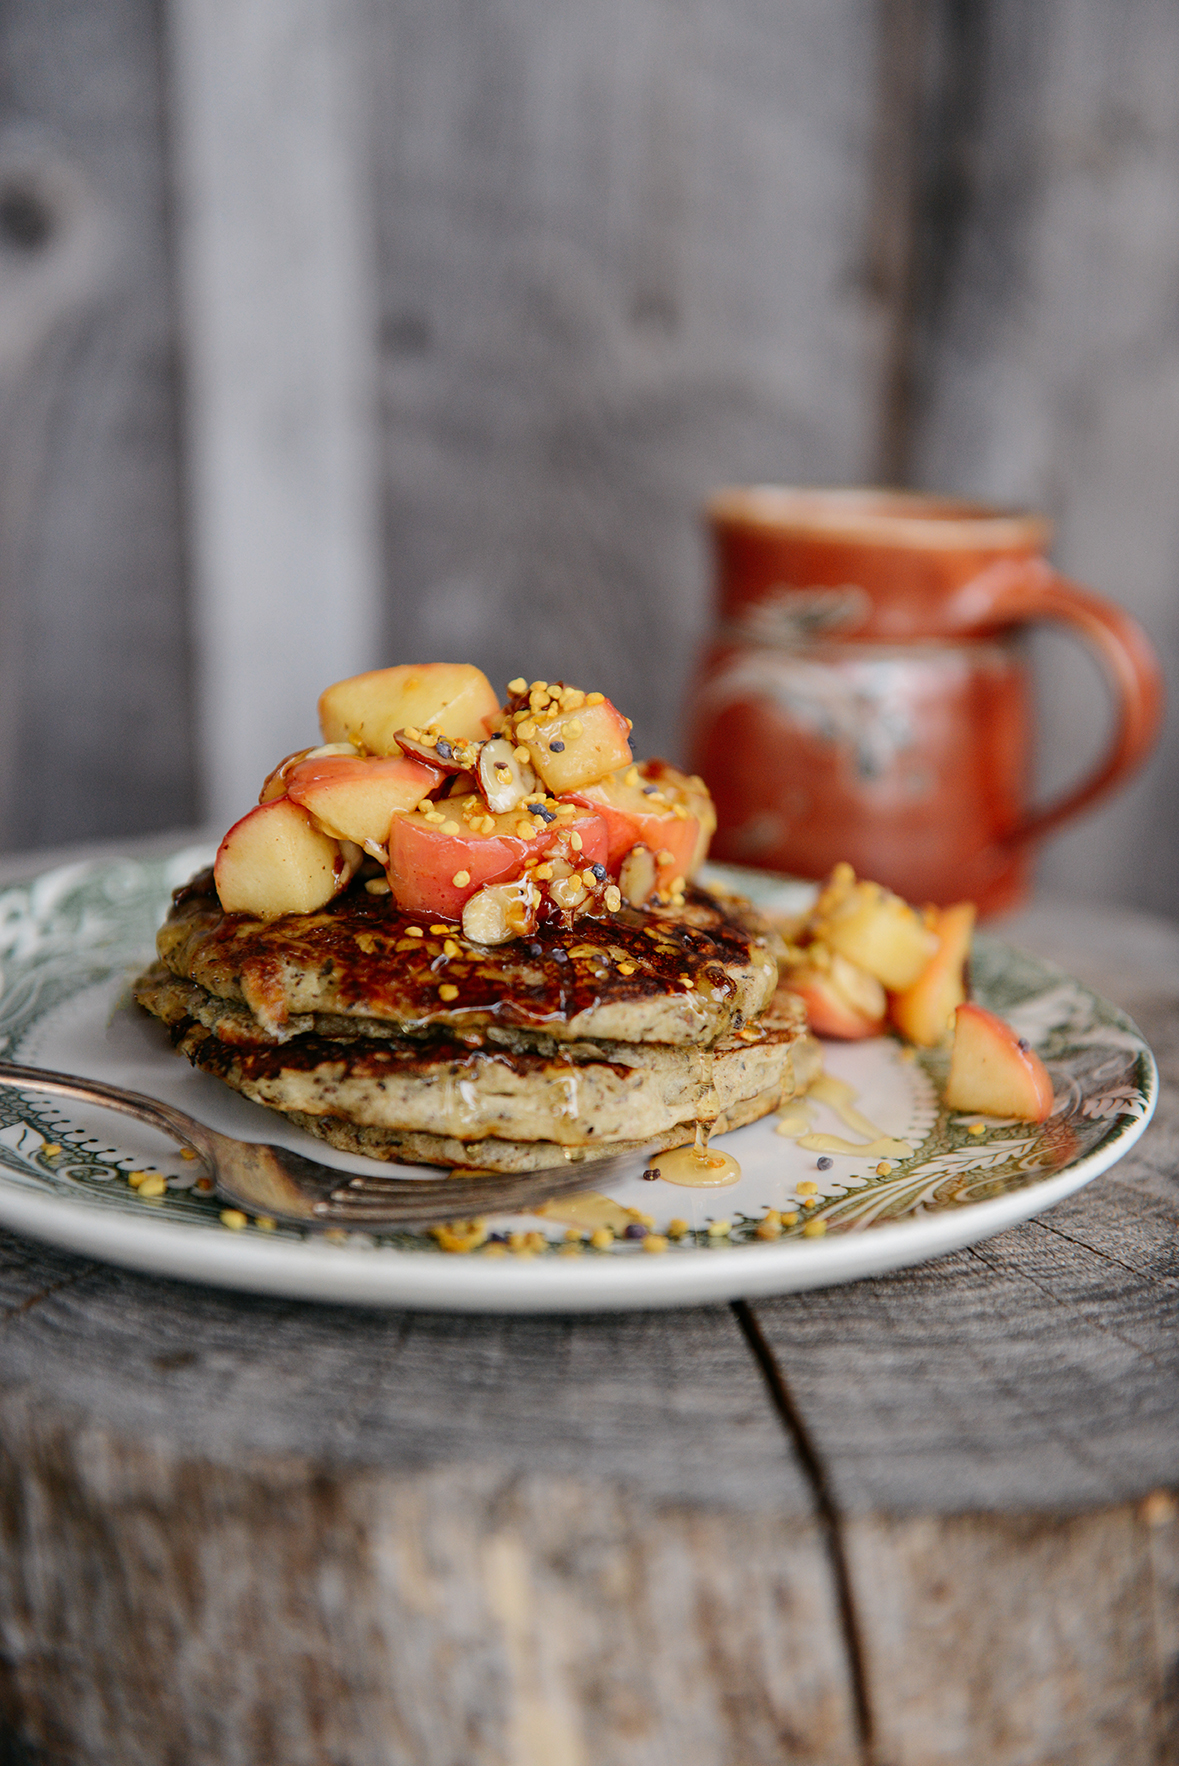 Honey Buckwheat Pancakes with Caramelized Apples & Bee Pollen